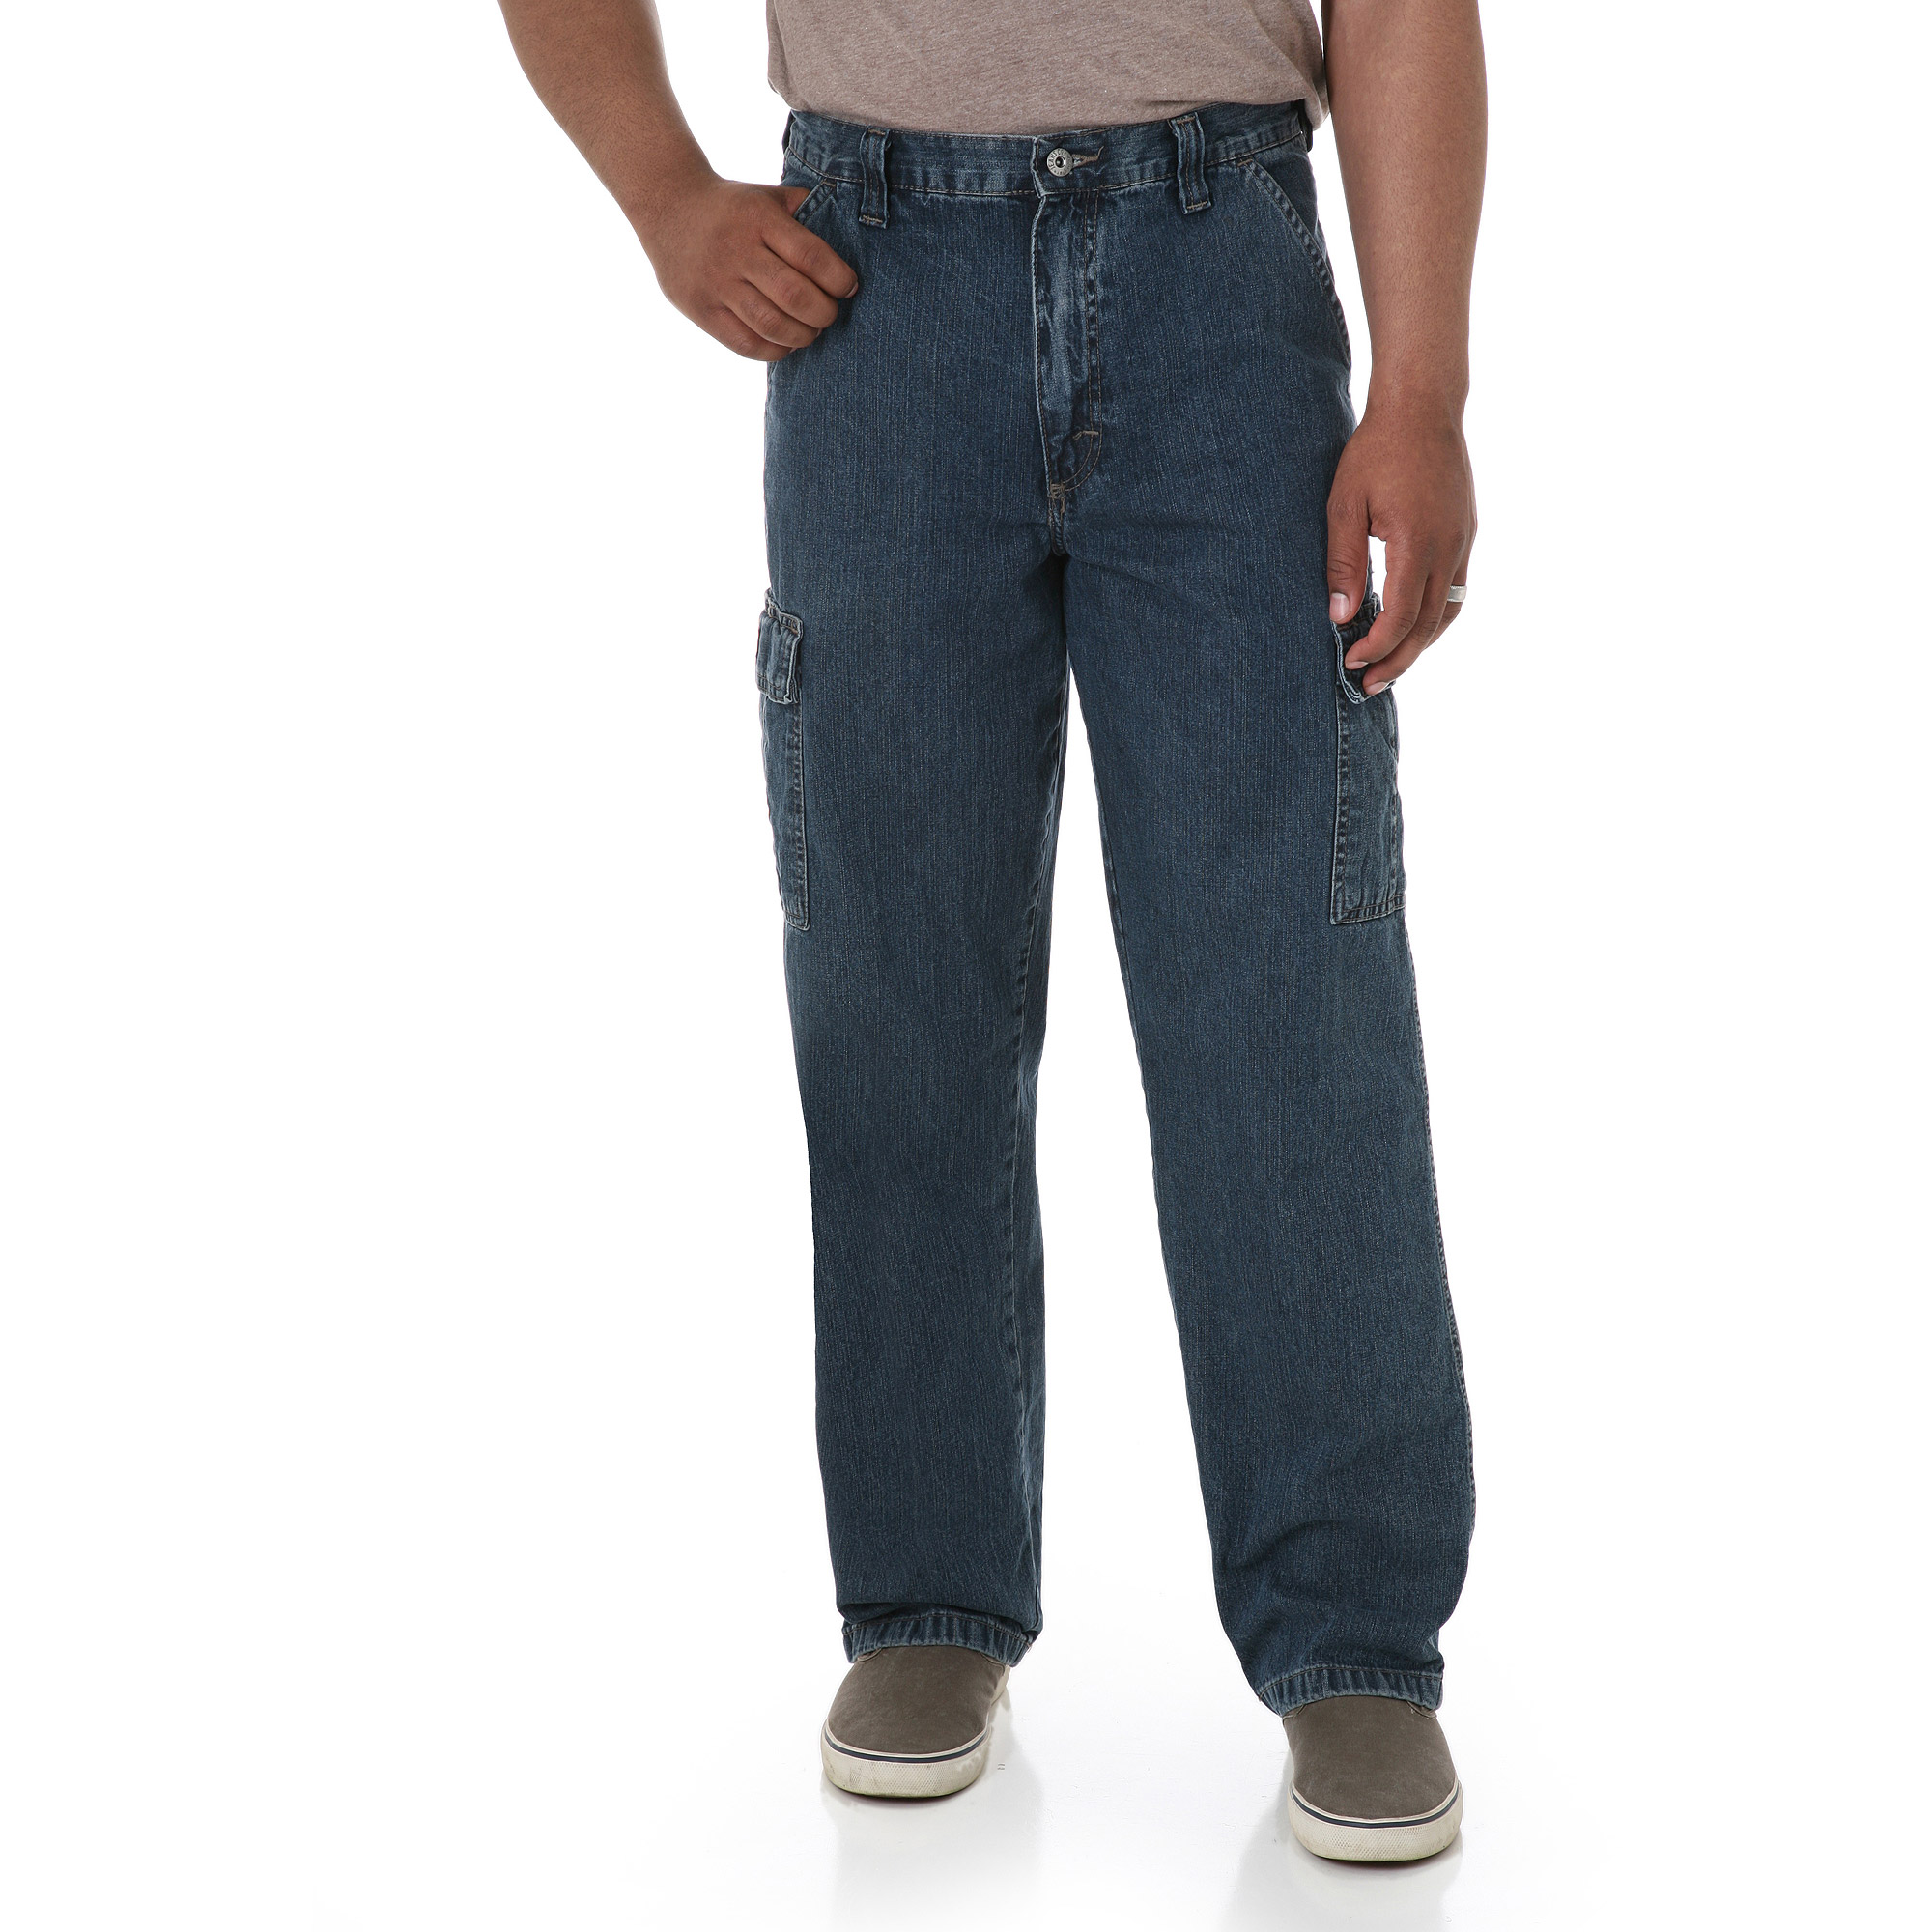 Wrangler - Men's Cargo Jeans - Walmart.com